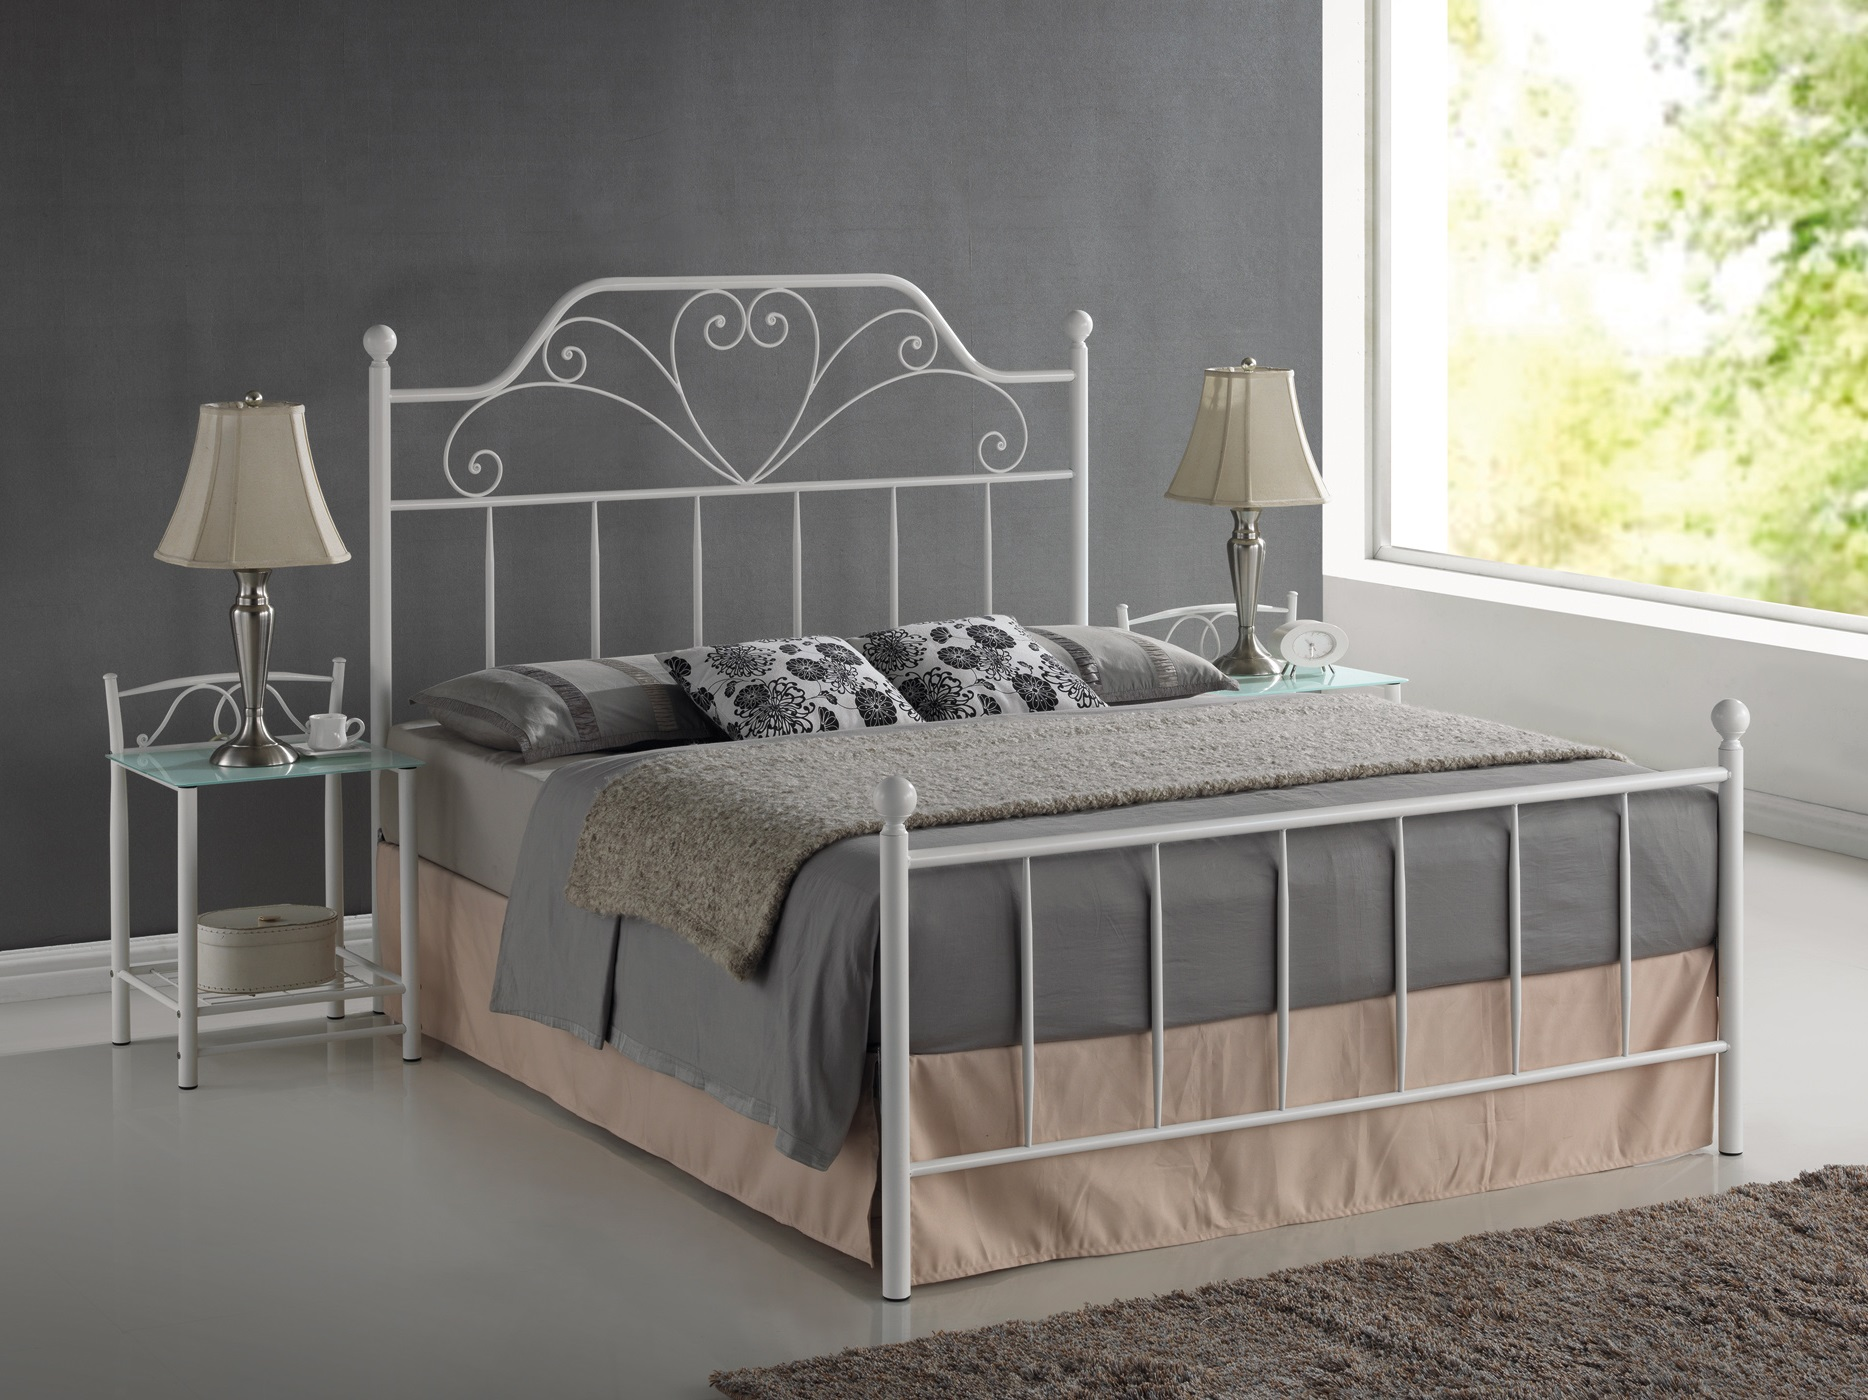 metallbett doppelbett 160x200 weiss top neu 2016 mit lattenrost 90x200 ehebett ebay. Black Bedroom Furniture Sets. Home Design Ideas